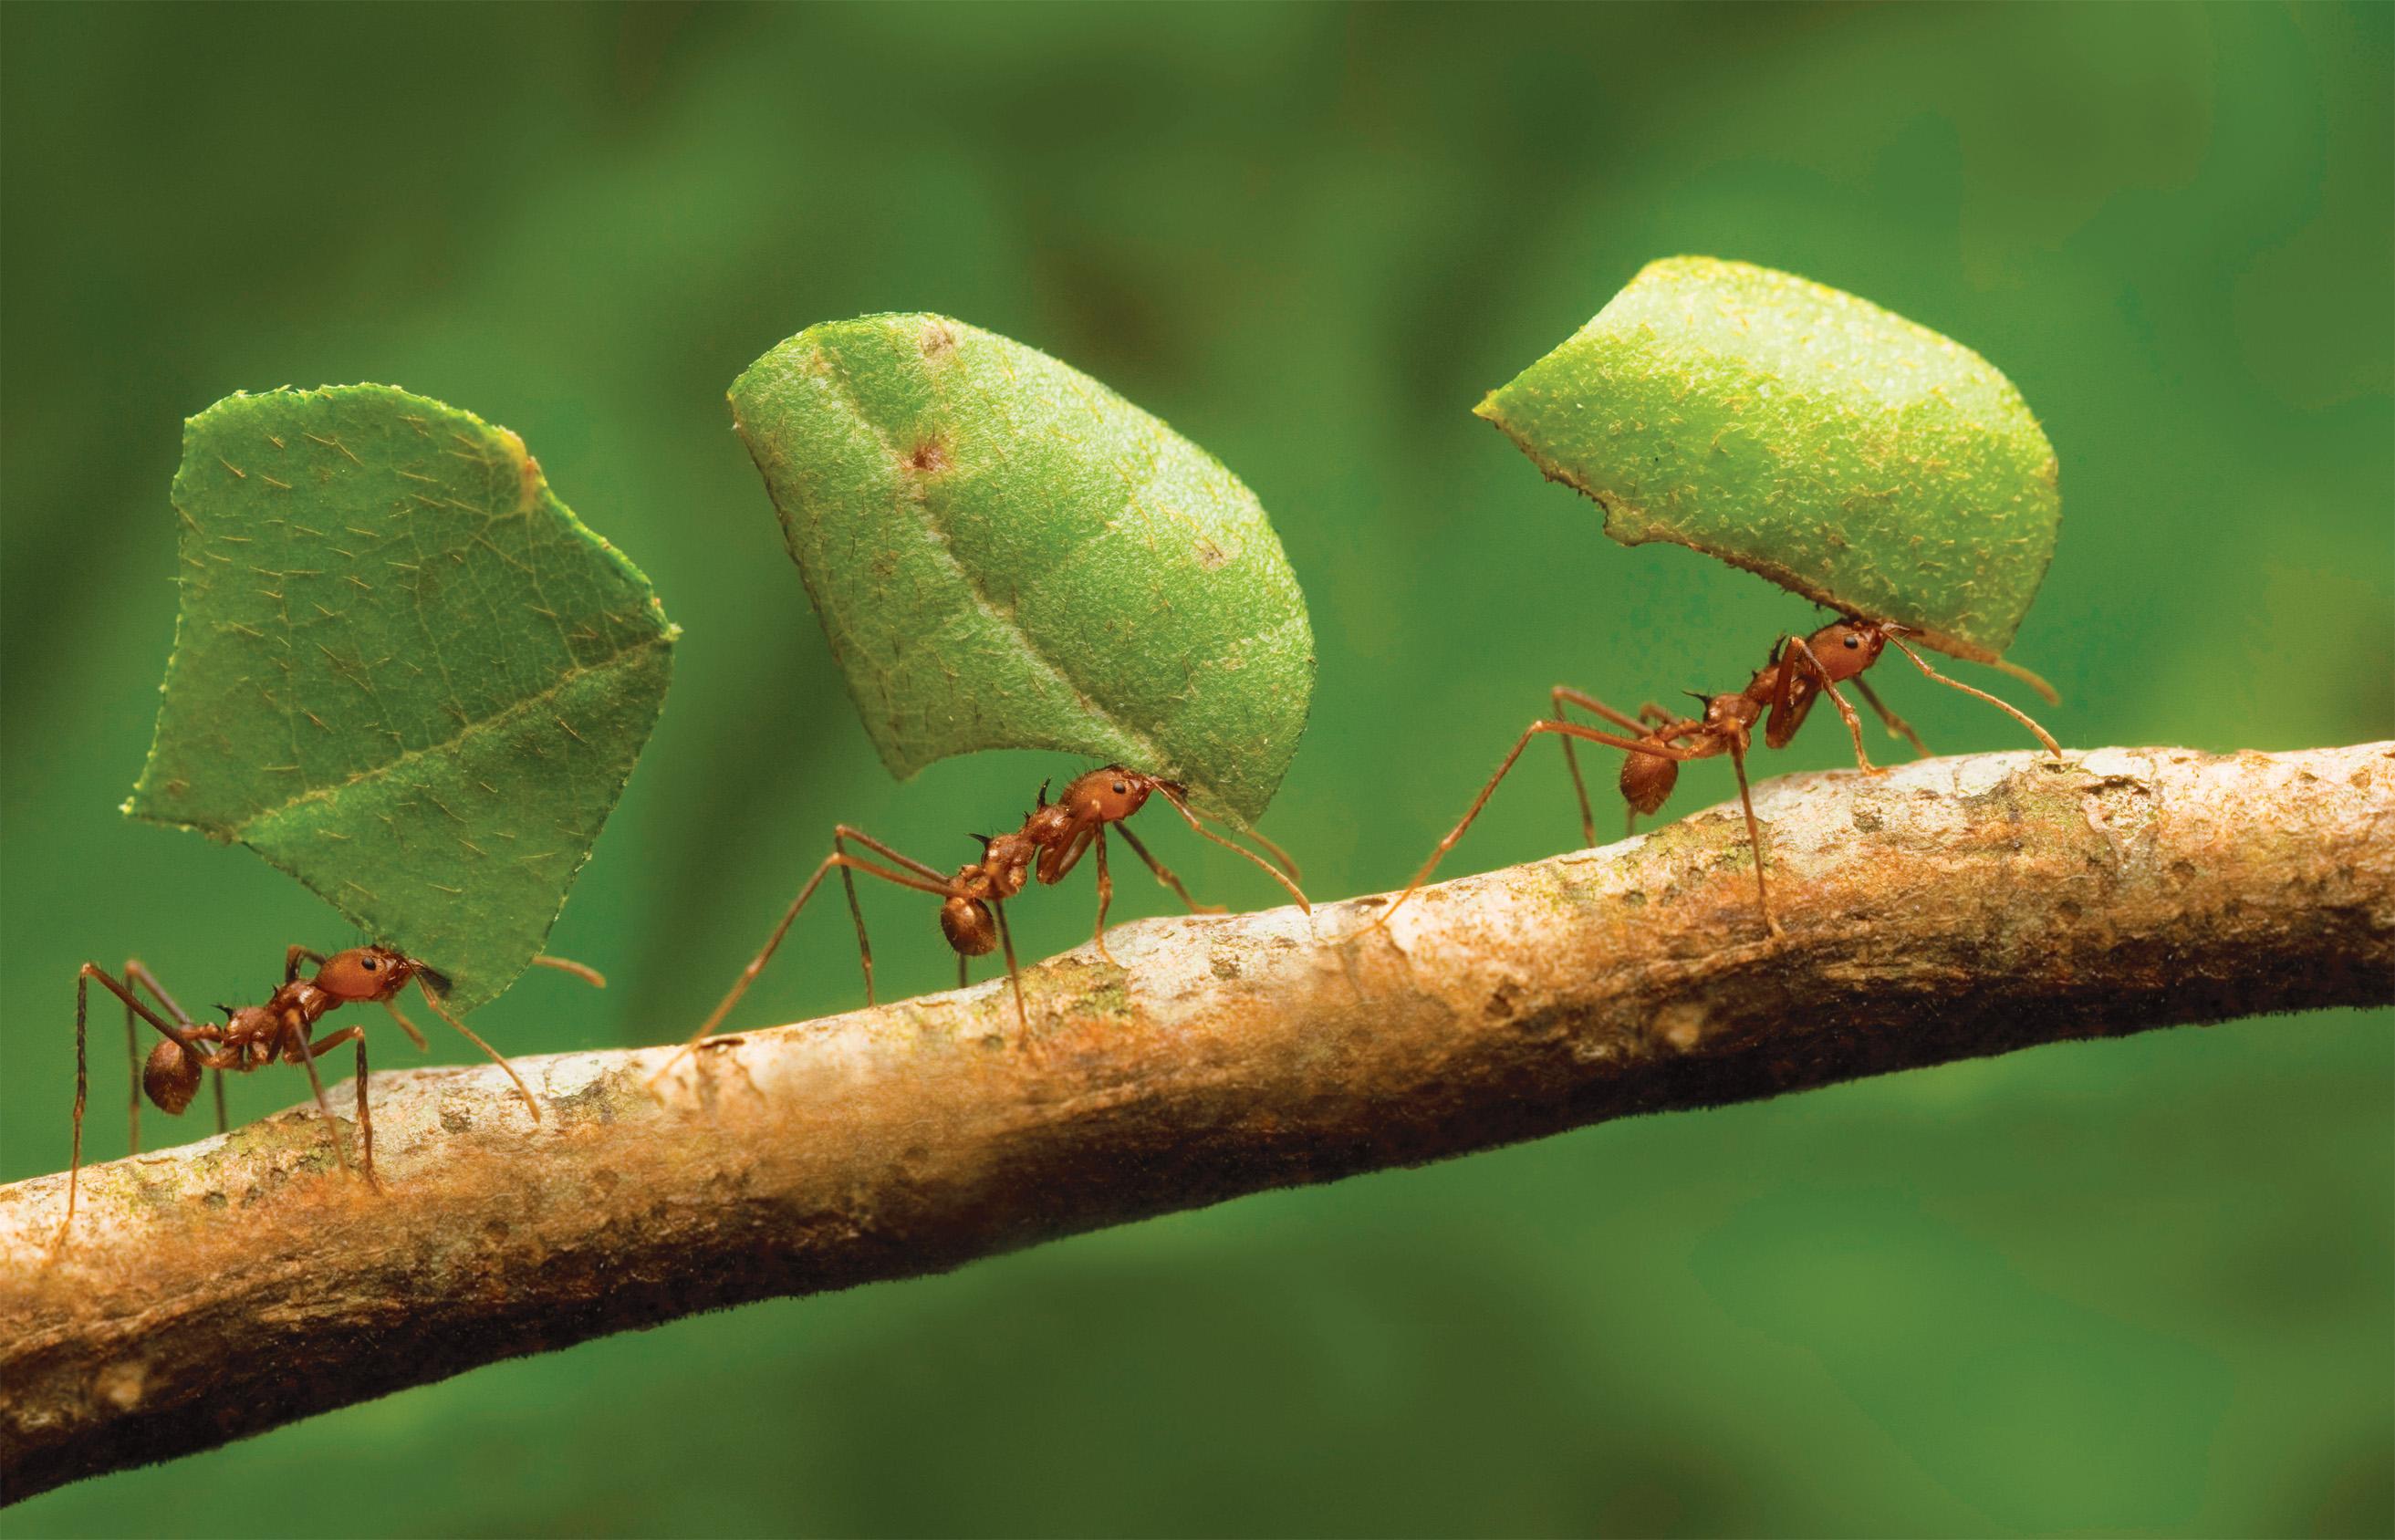 may 3rd - ants : sketchdaily